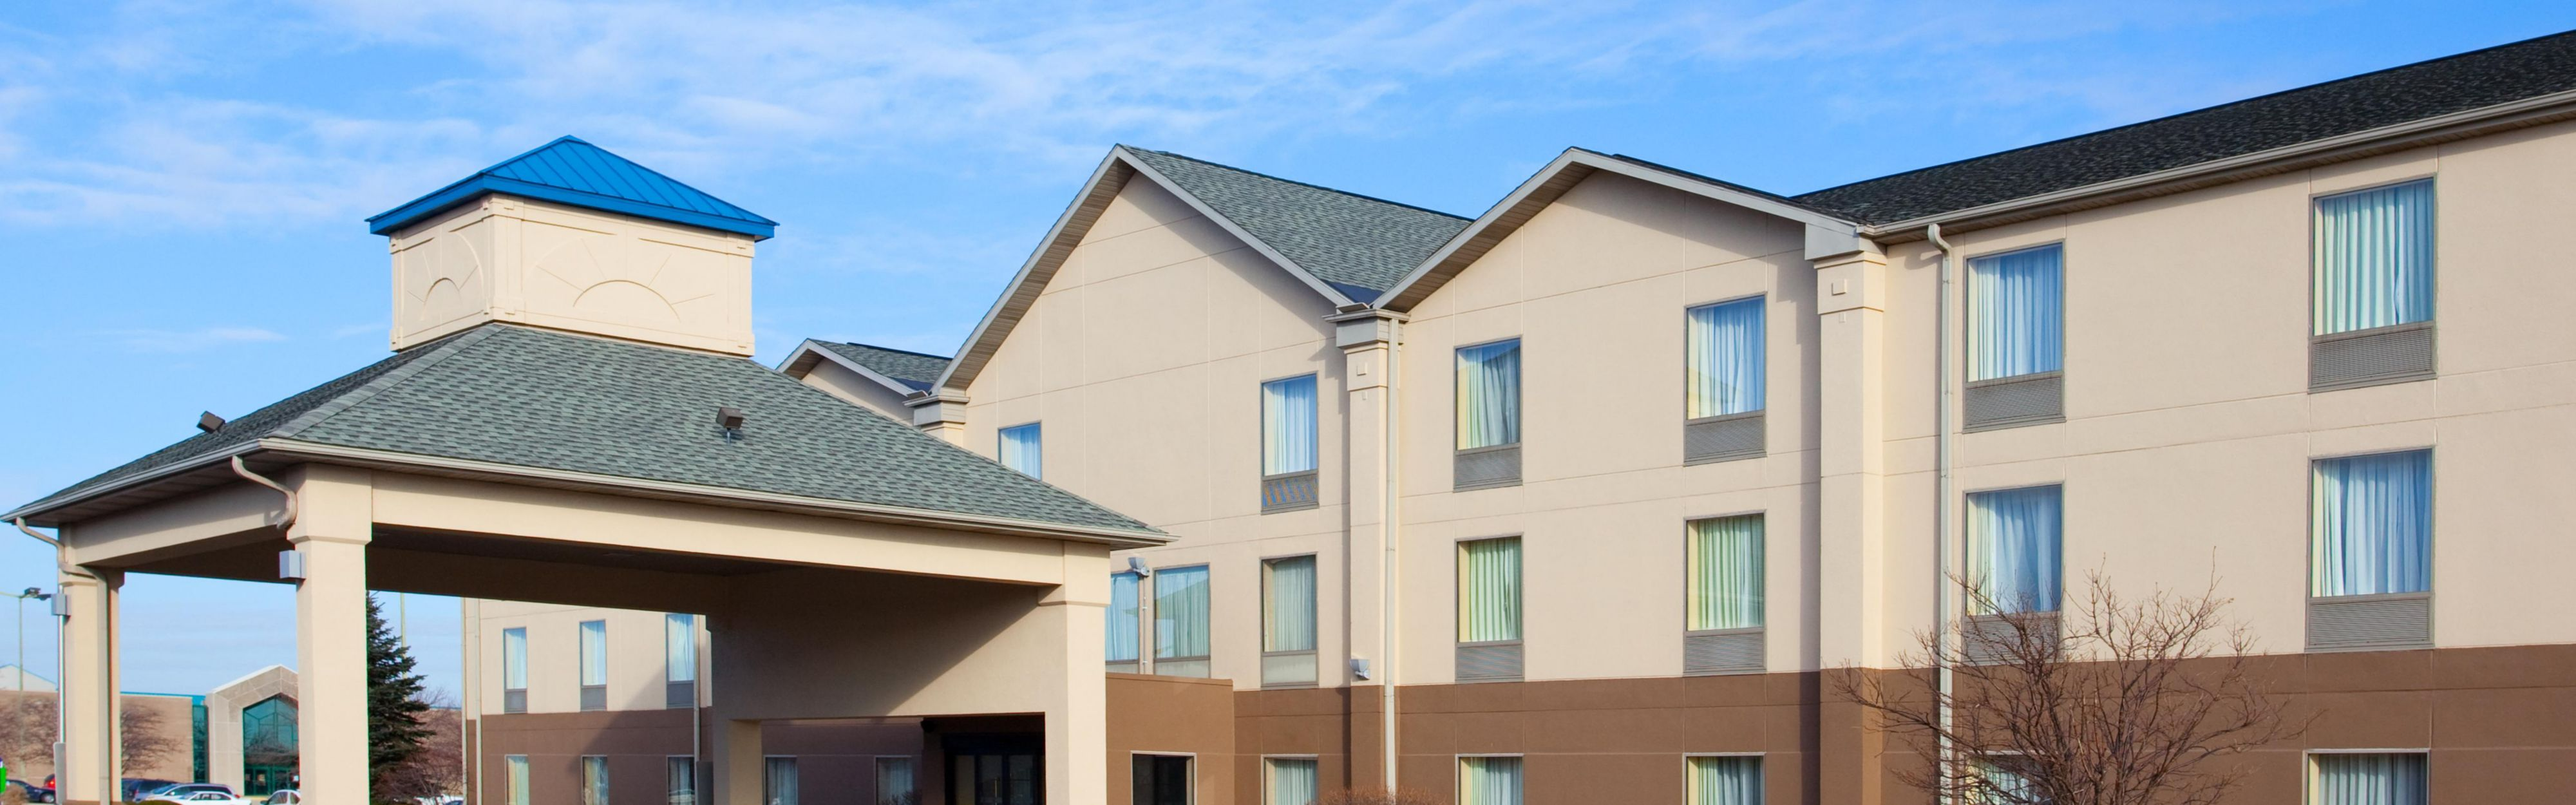 Holiday Inn Express & Suites Bourbonnais (Kankakee/Bradley) image 0